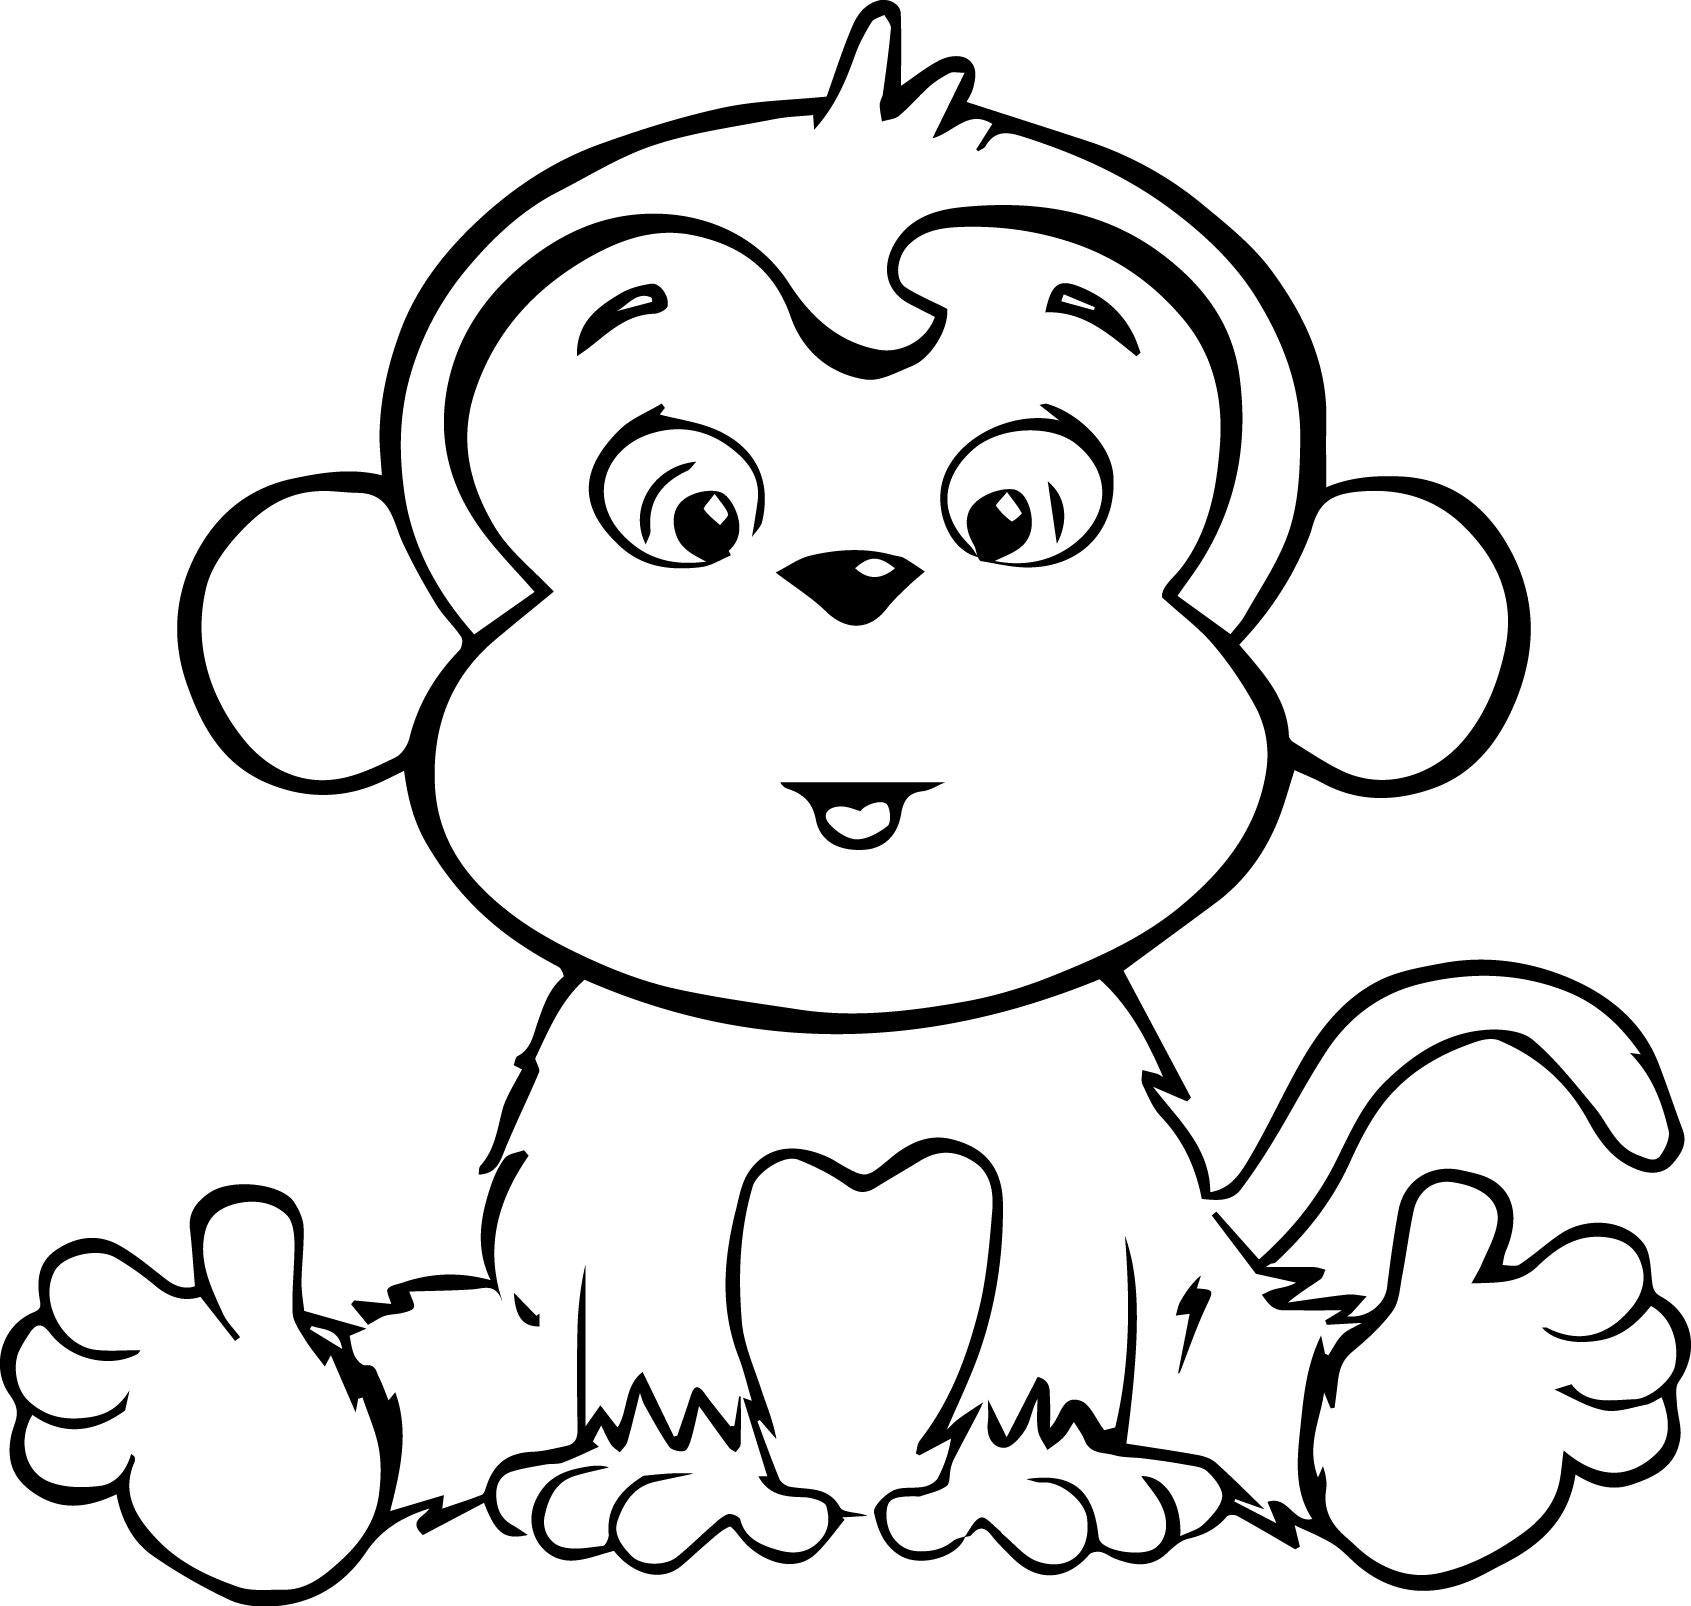 1691x1606 Cartoon Deadpool Coloring Photo Album Website Cartoon Coloring